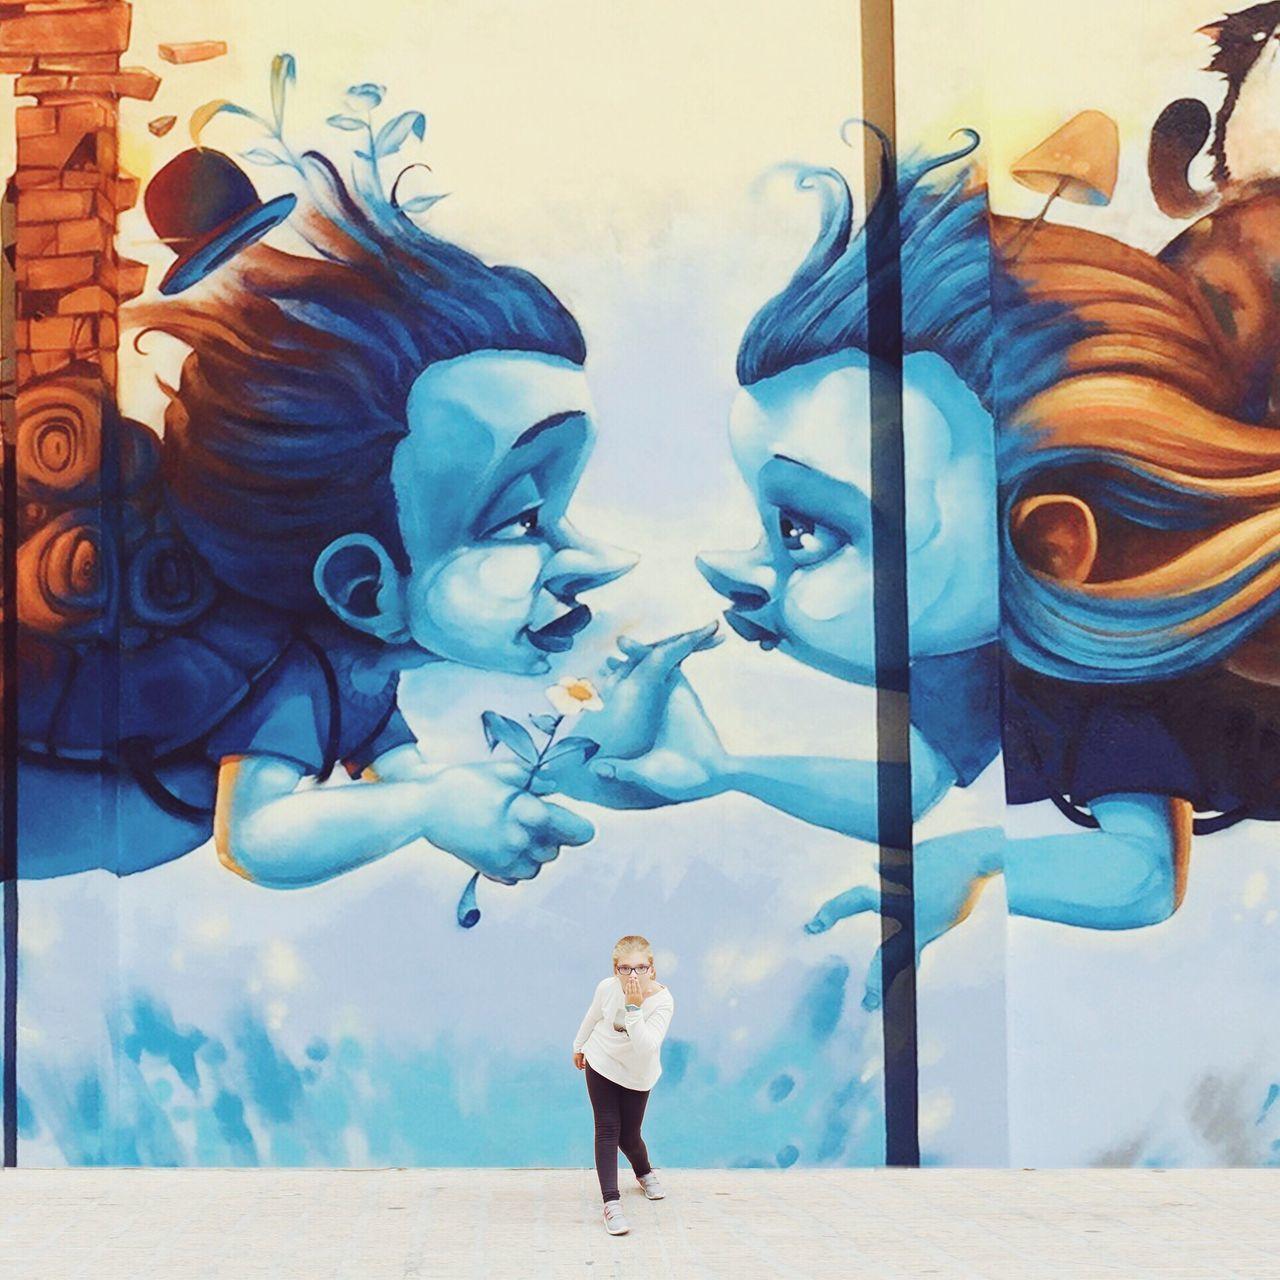 Graffiti People One Person